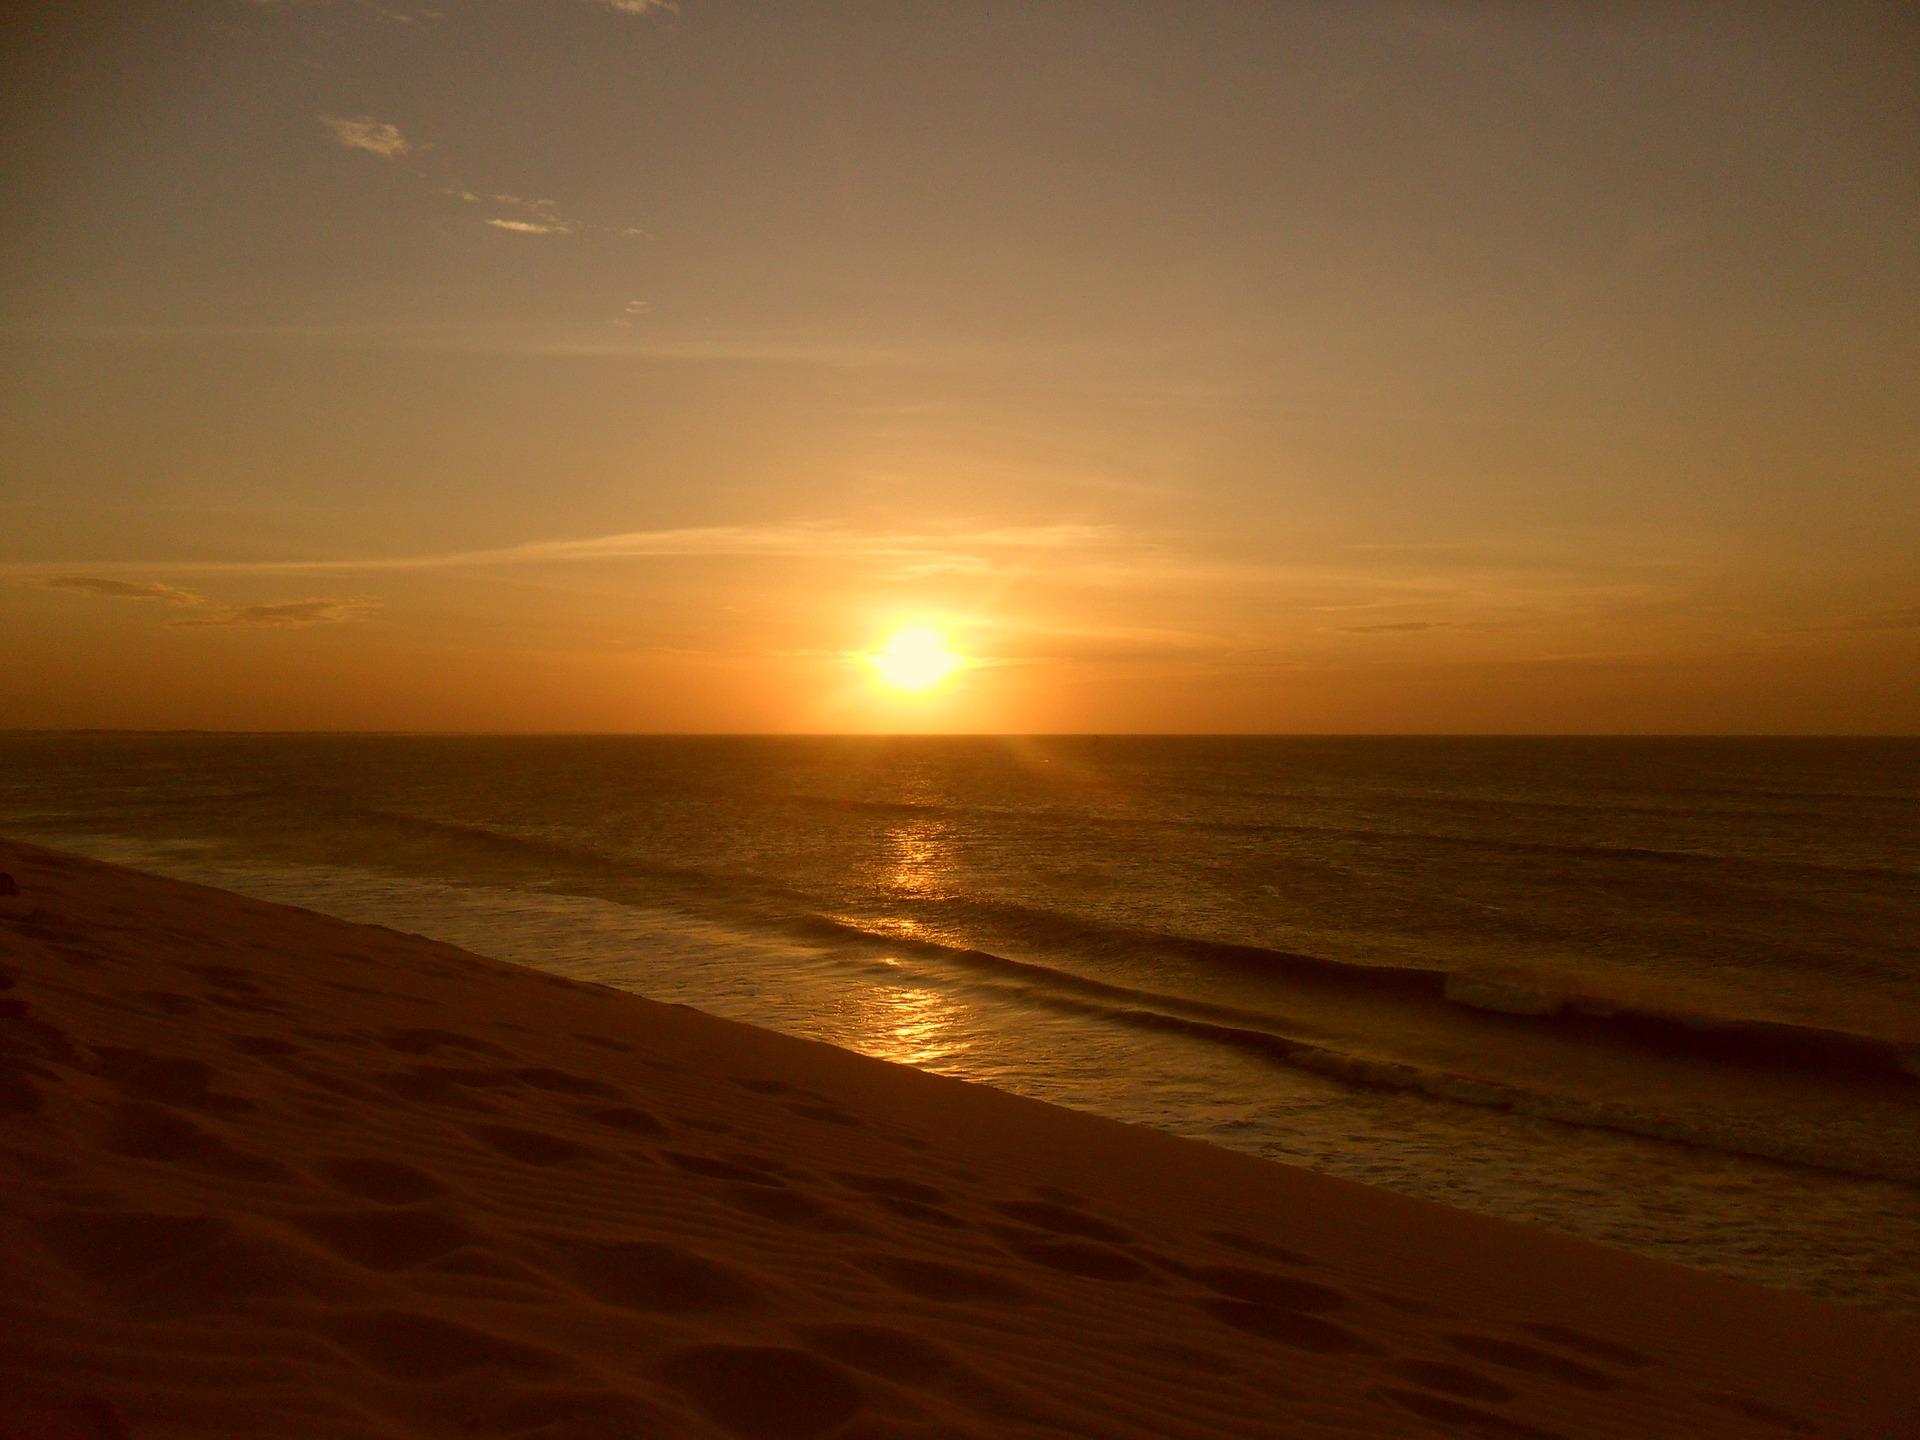 Pôr do sol em Jericoacoara, Ceará